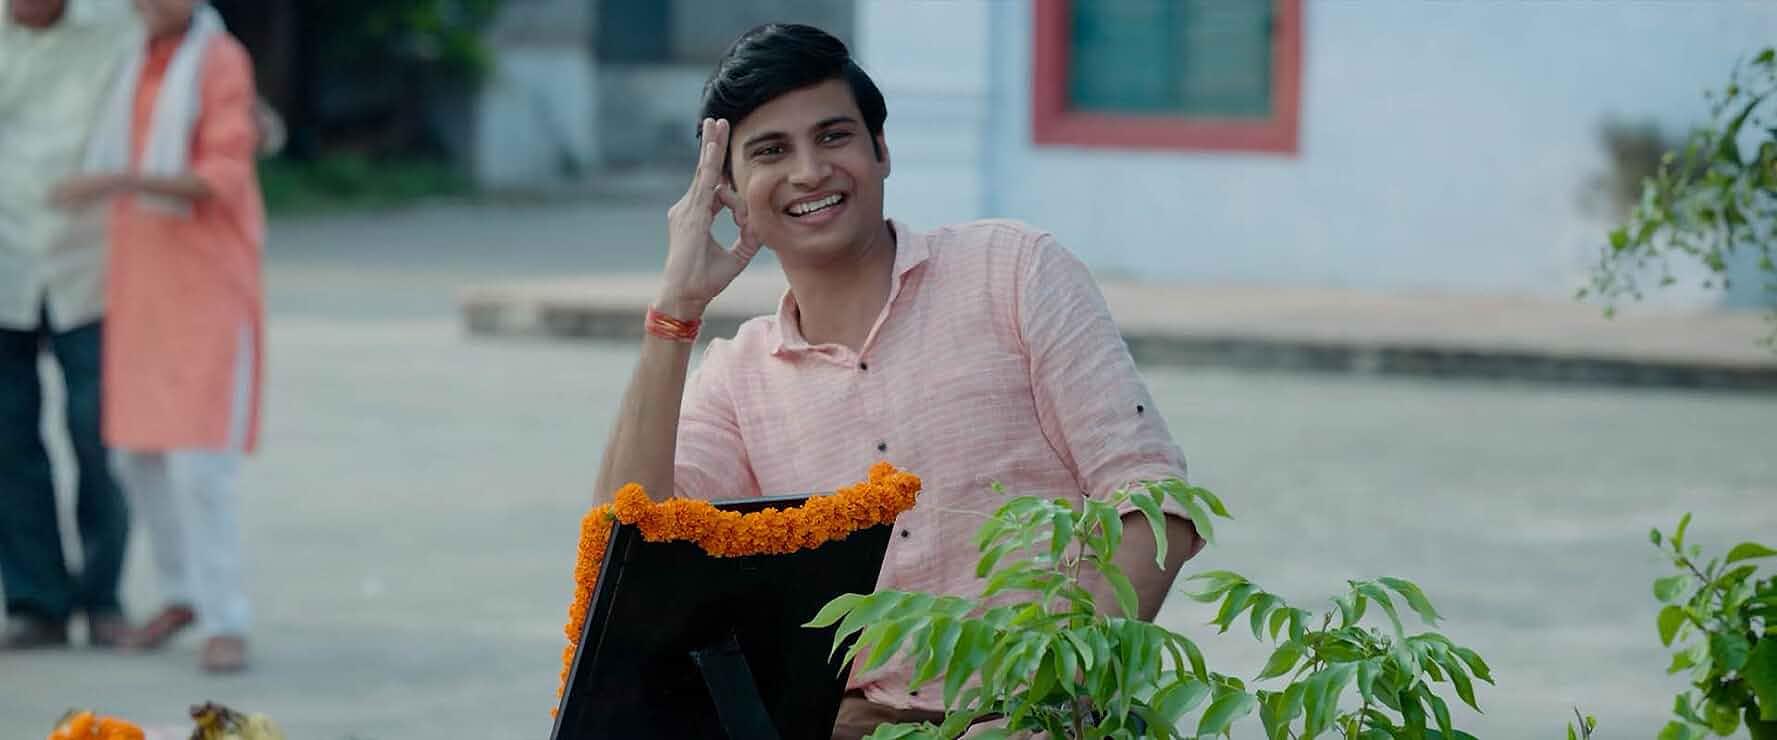 Shubh Mangal Zyada Saavdhan (2020) Full Movie Download In Hindi